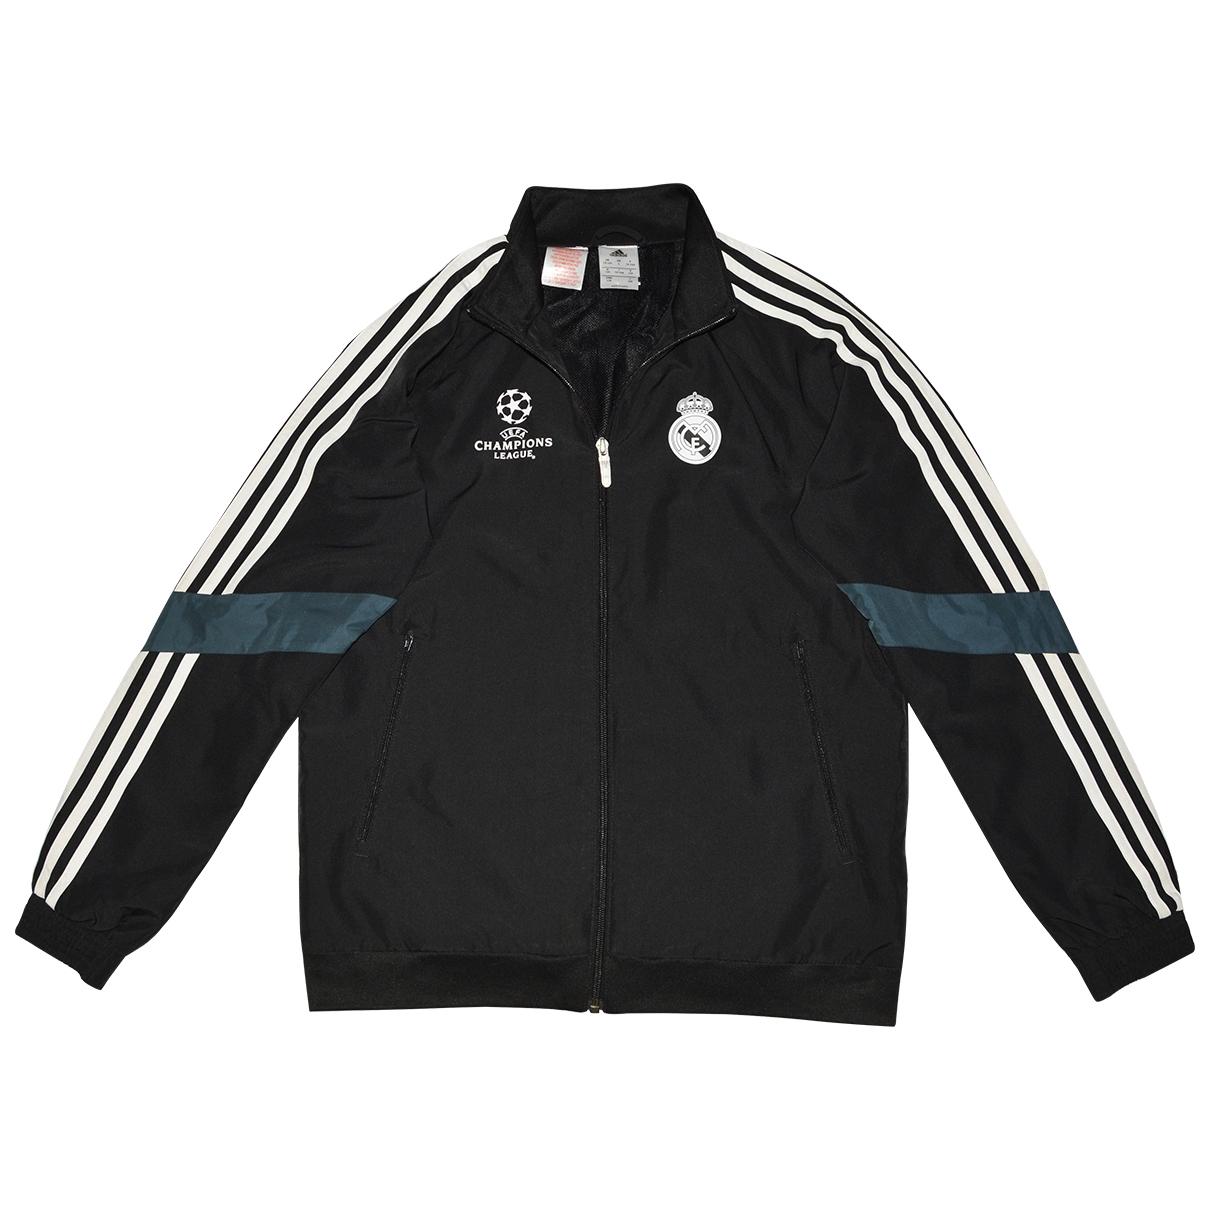 Adidas \N Black jacket & coat for Kids 14 years - S UK